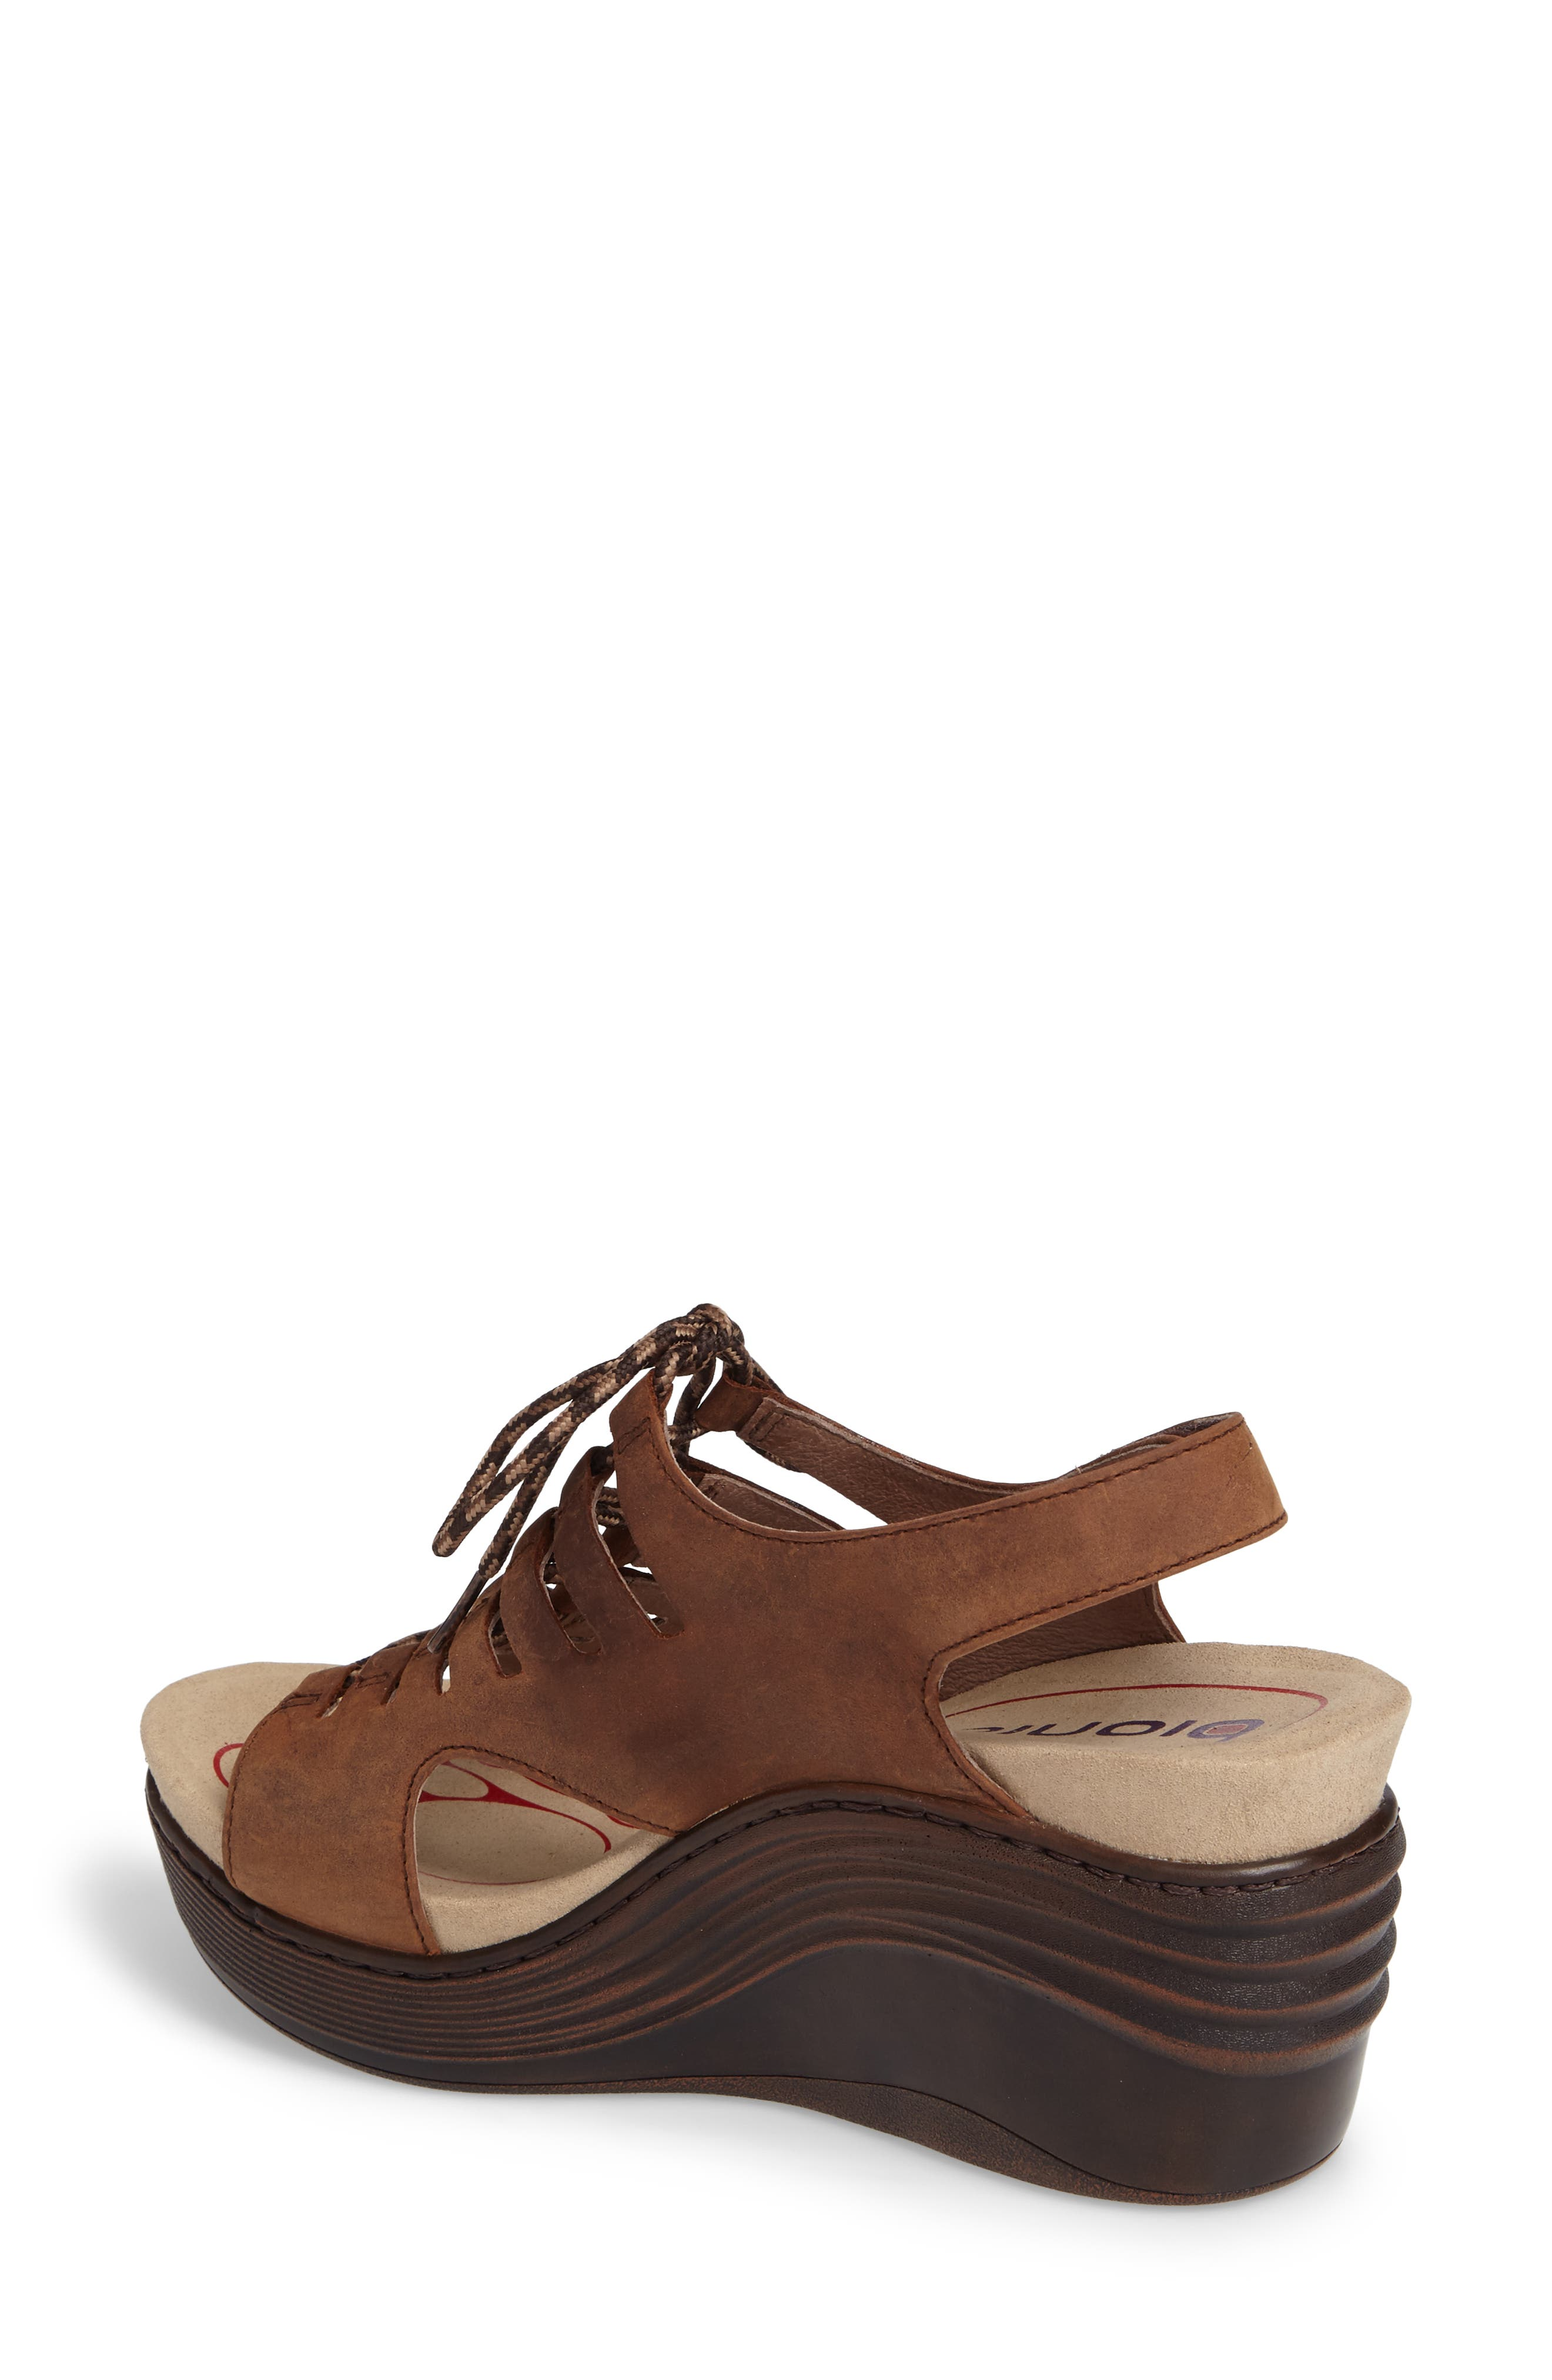 Sirus Wedge Sandal,                             Alternate thumbnail 2, color,                             Aztec Brown Leather